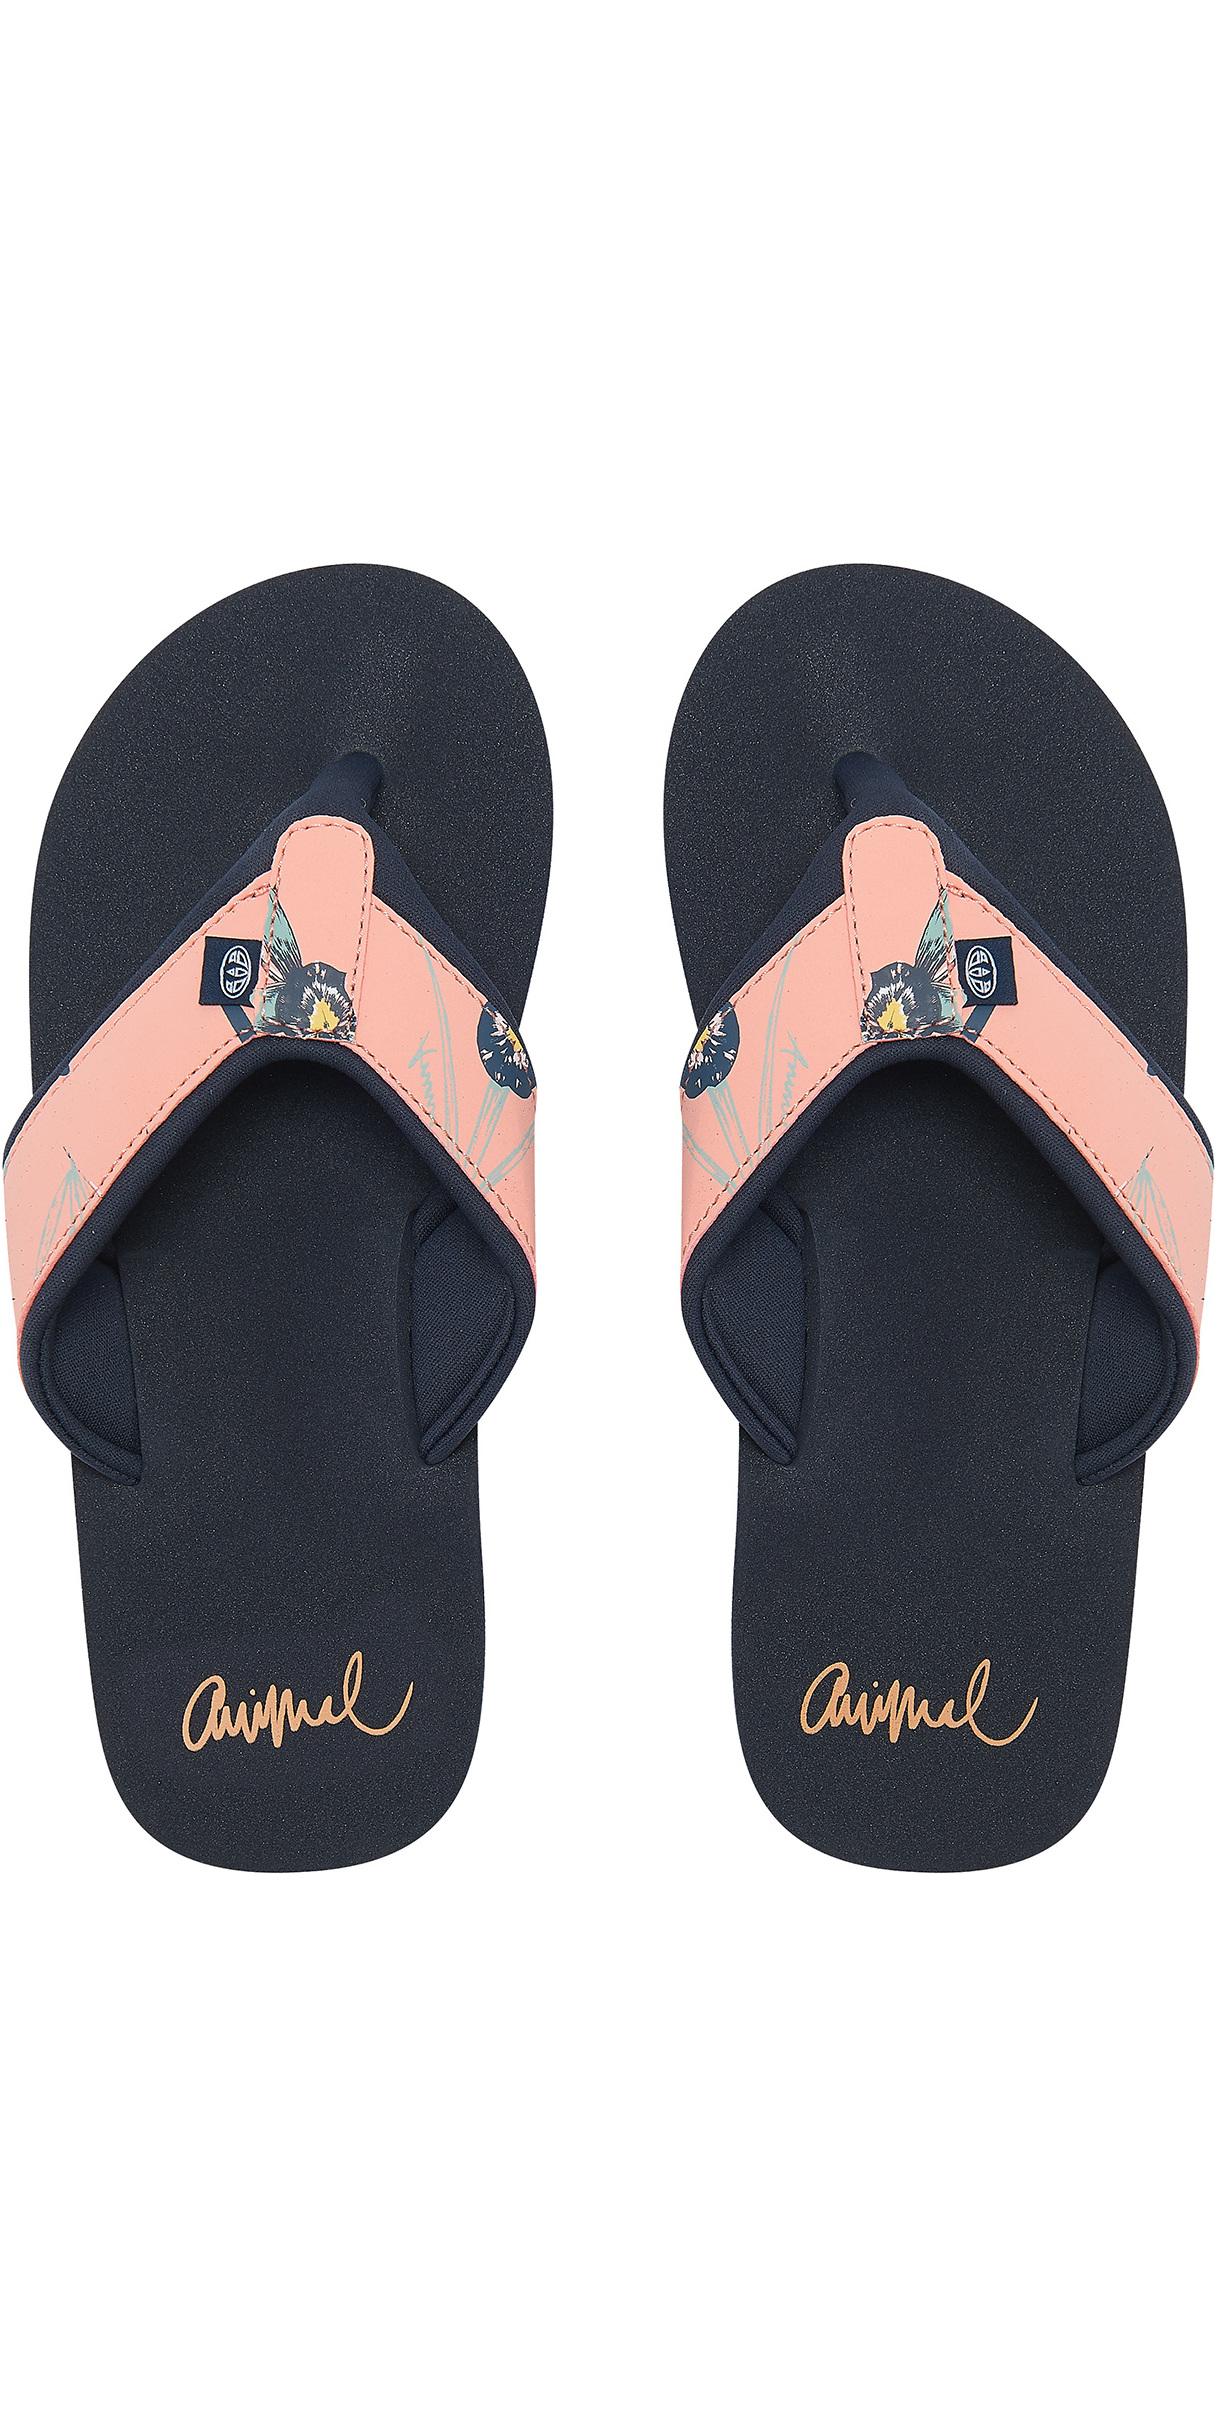 7267839e8 2019 Animal Womens Swish Upper Aop Flip Flops Sunset Pink Fm9sq307 - Flip  Flops - Footwear